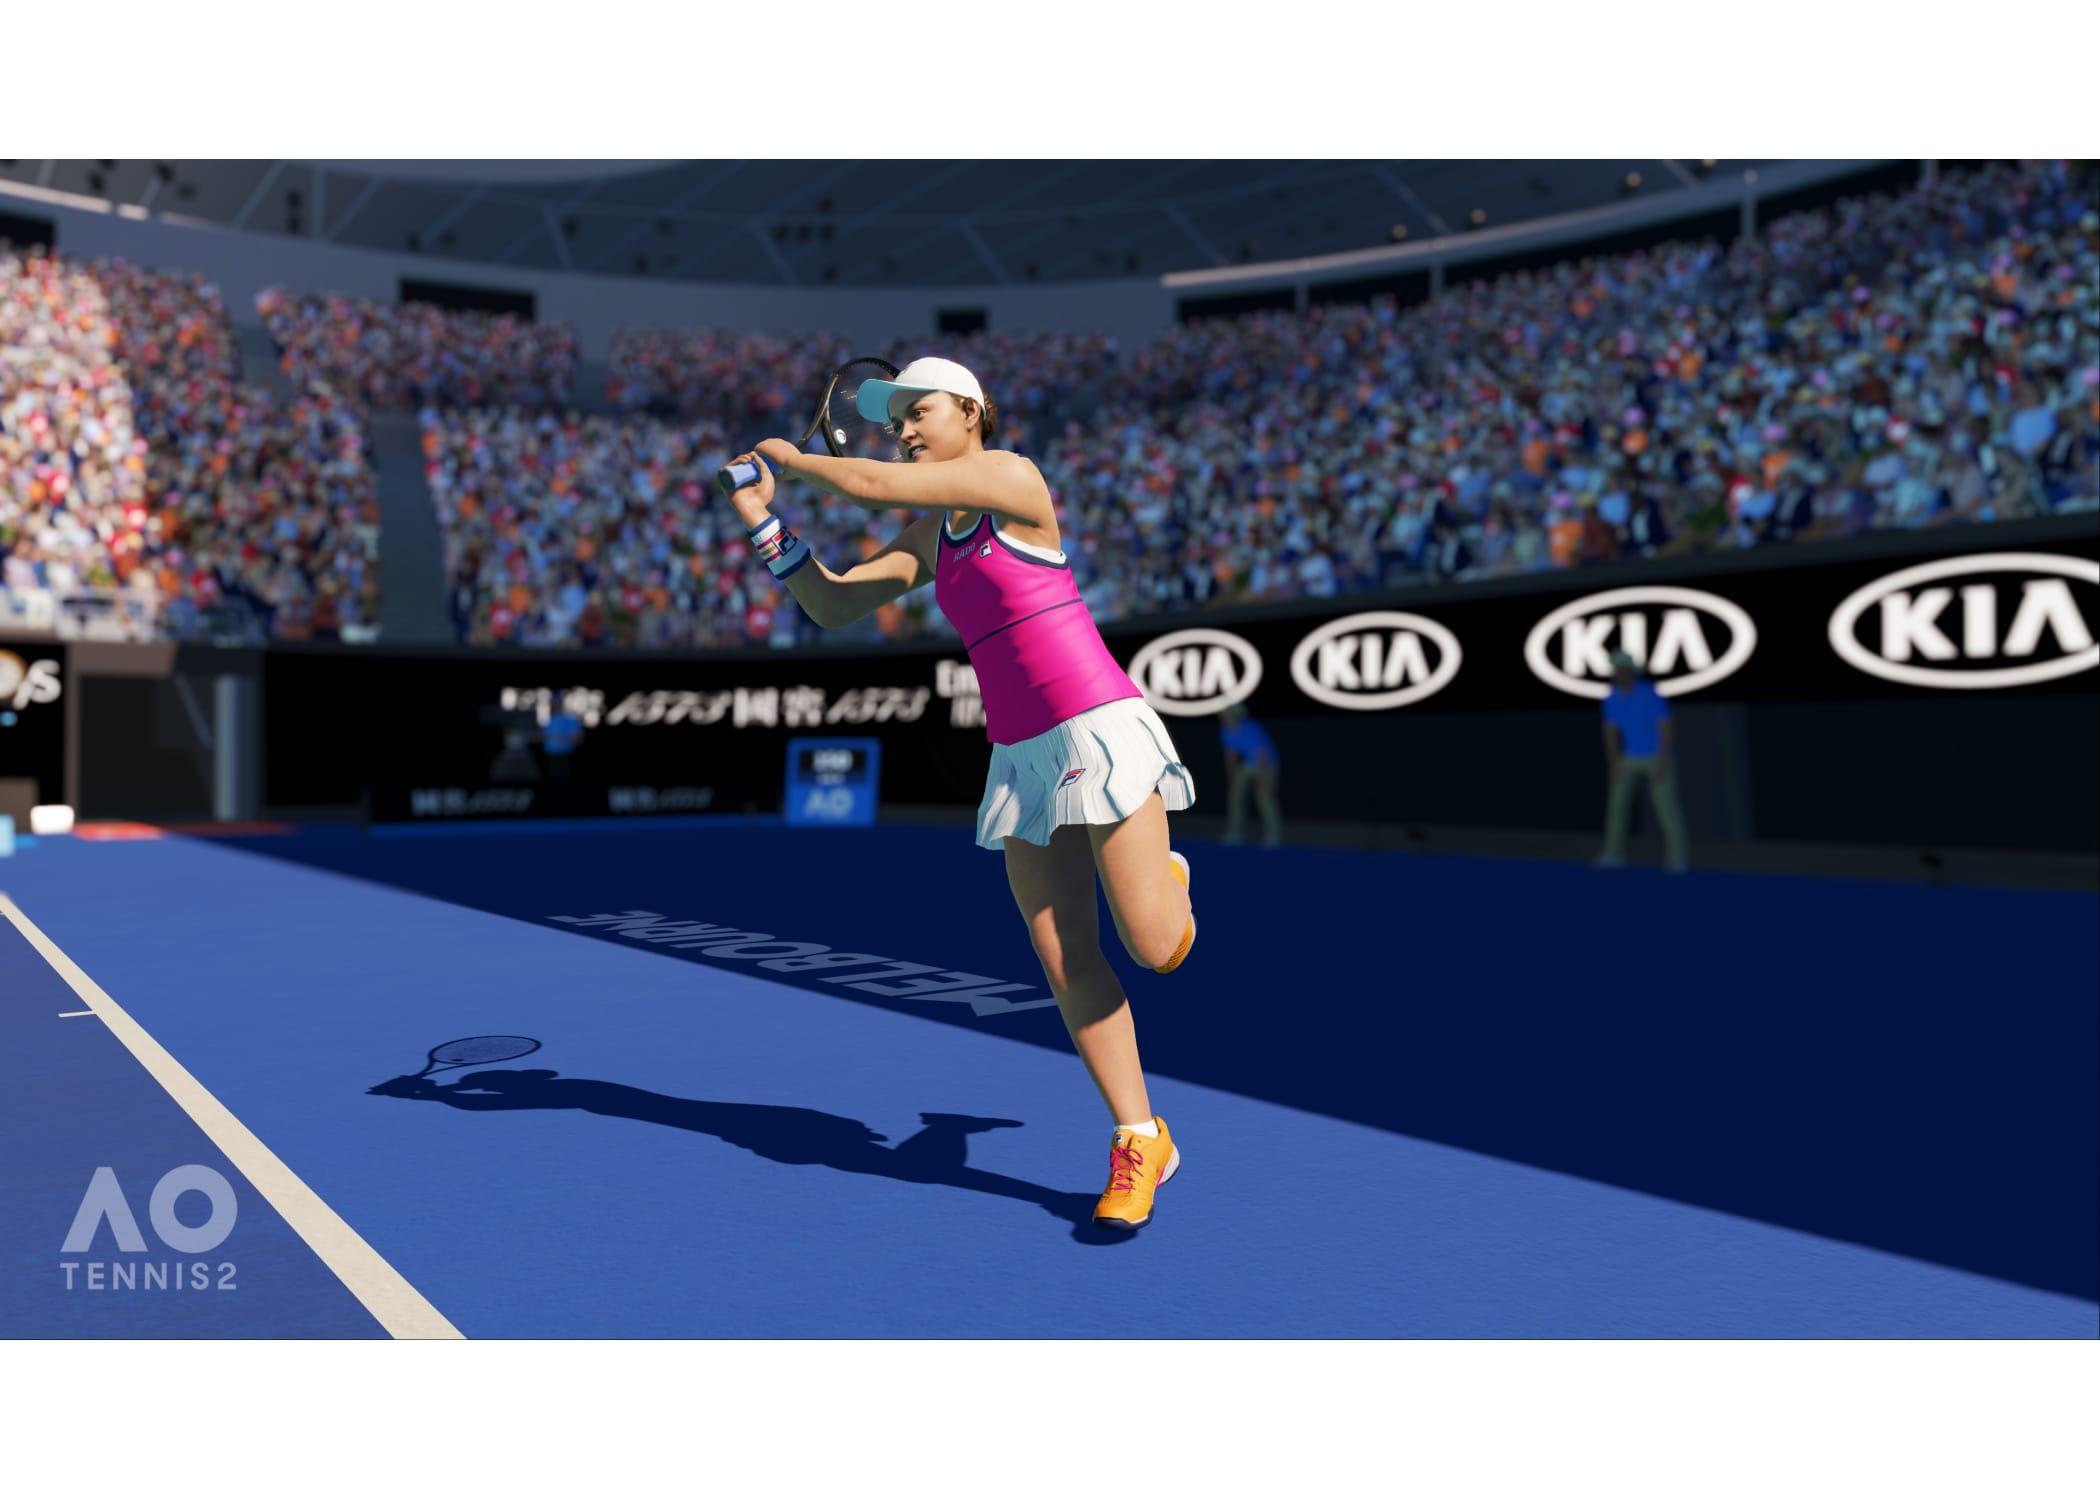 Ao Tennis 2 In 2020 Xbox One Games 2 In Social Media Logos